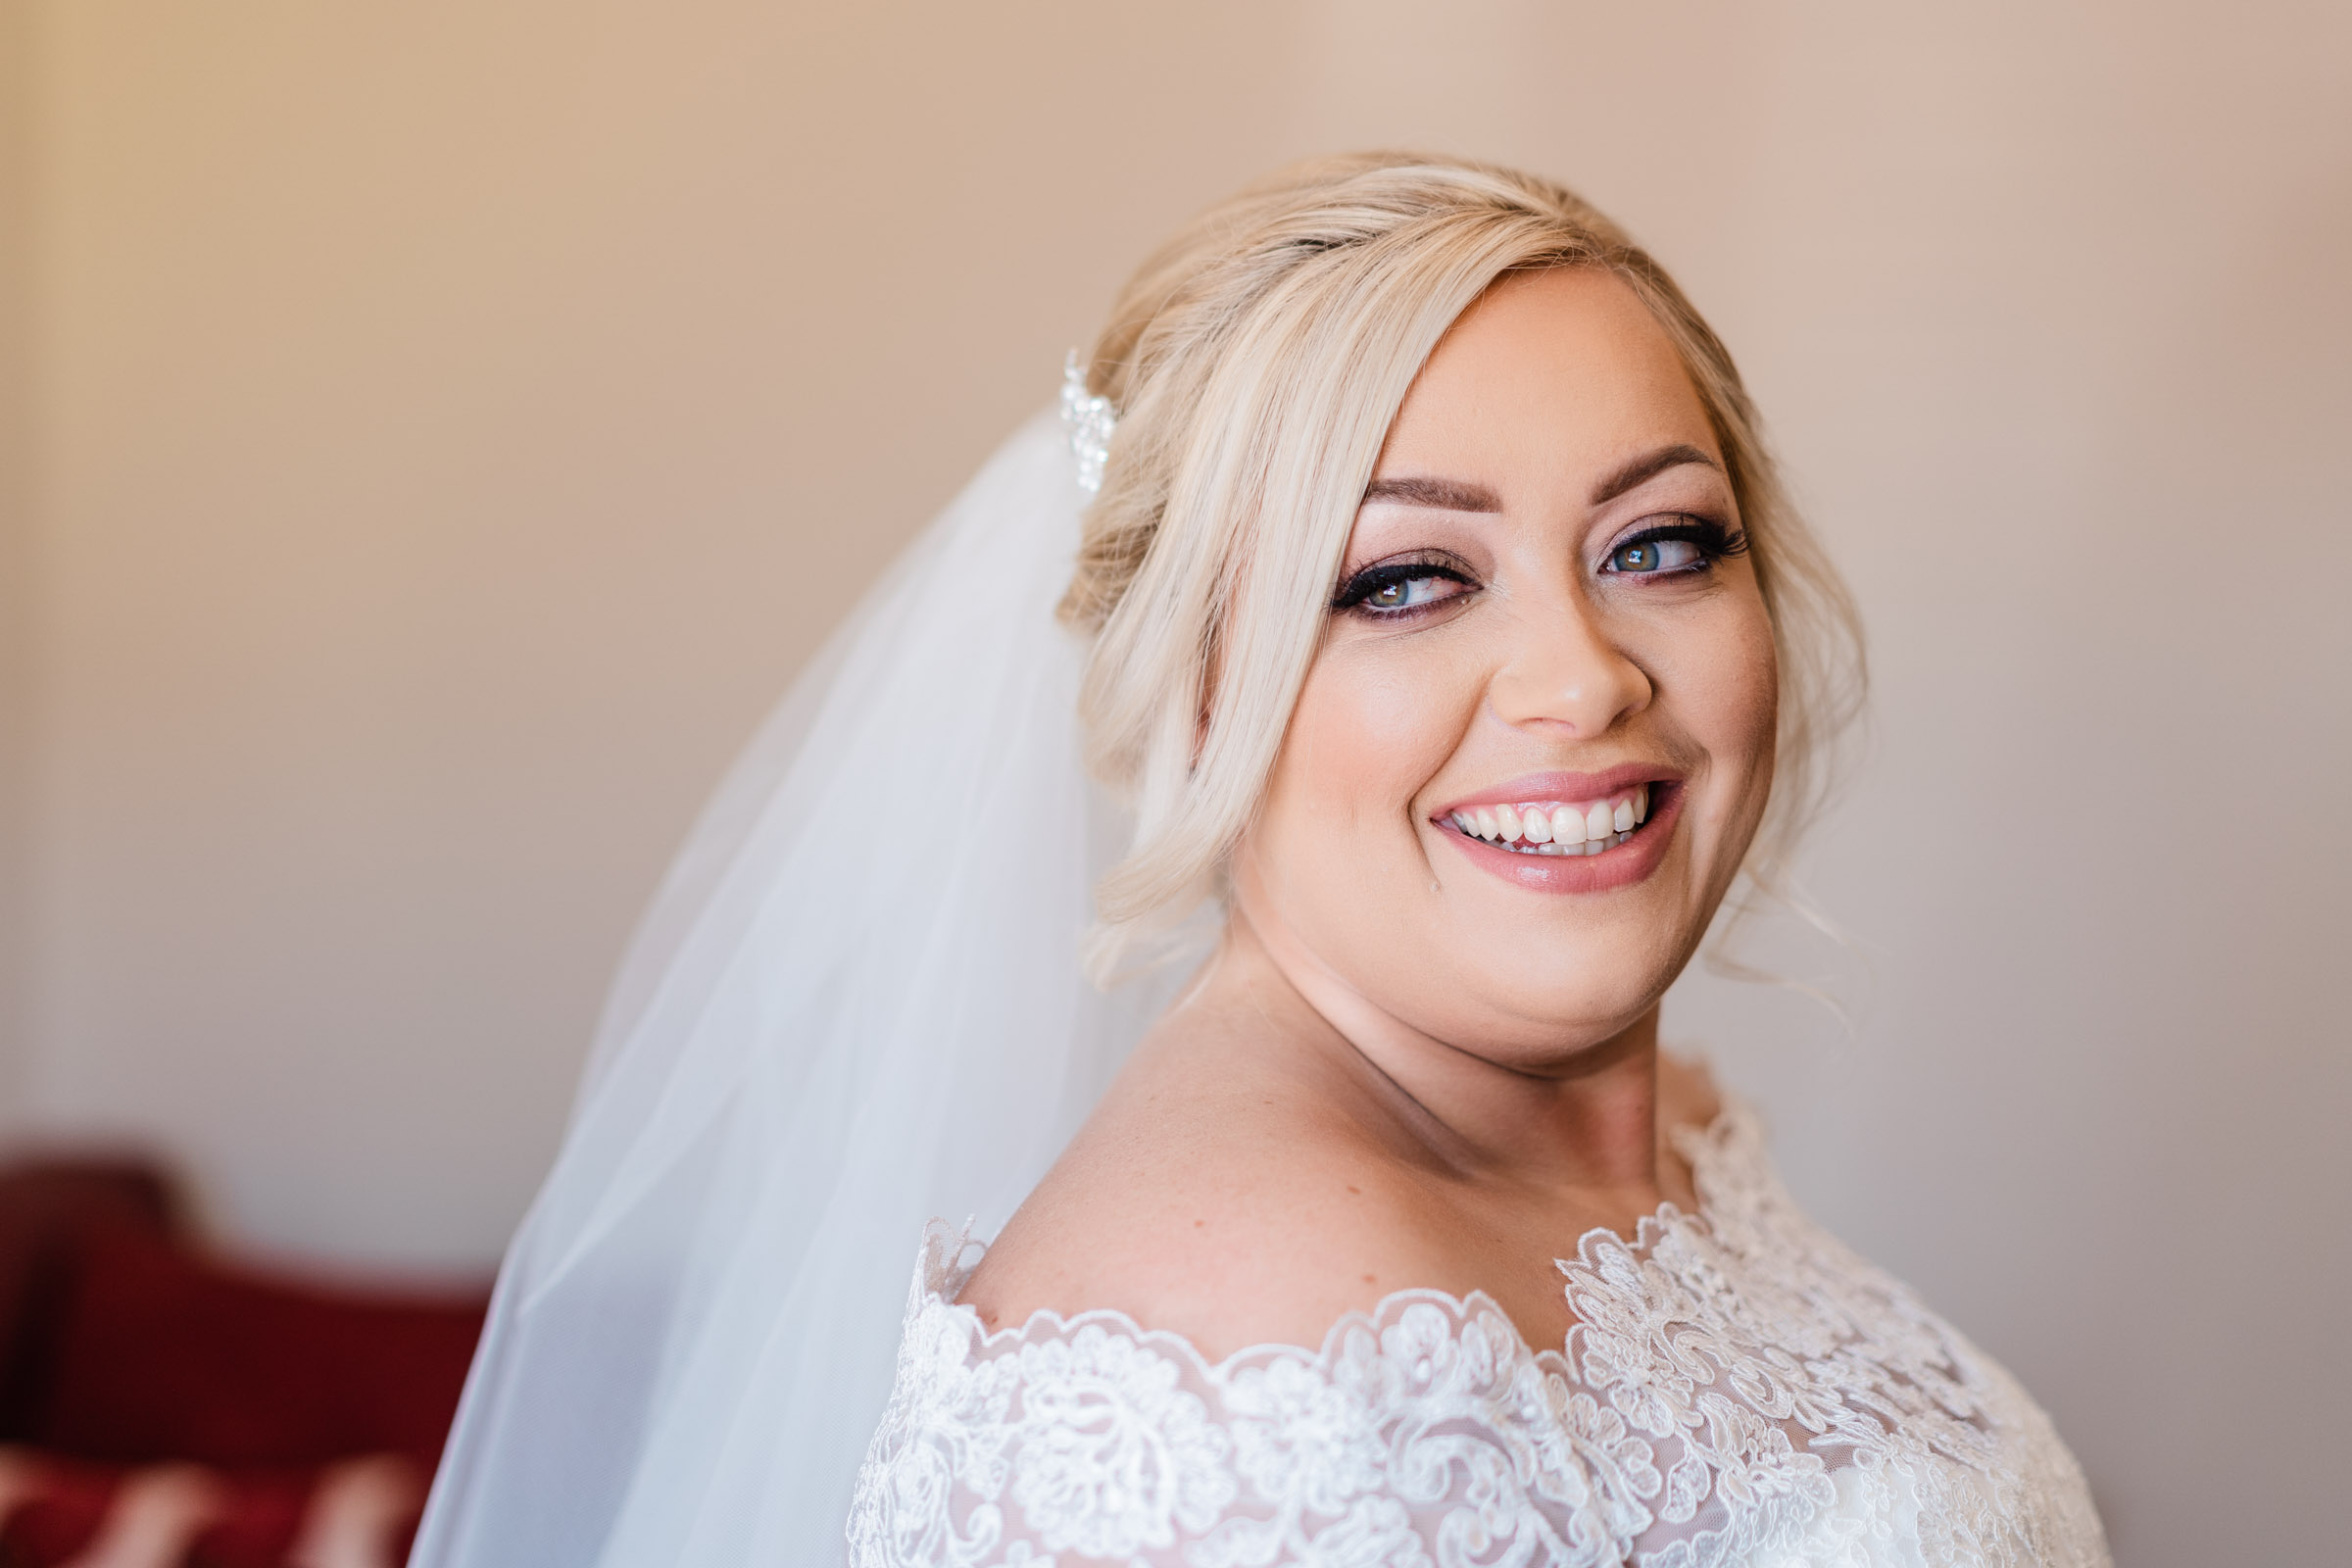 motherwell-moorings-wedding-photographer-dearlyphotography (18 of 77).jpg